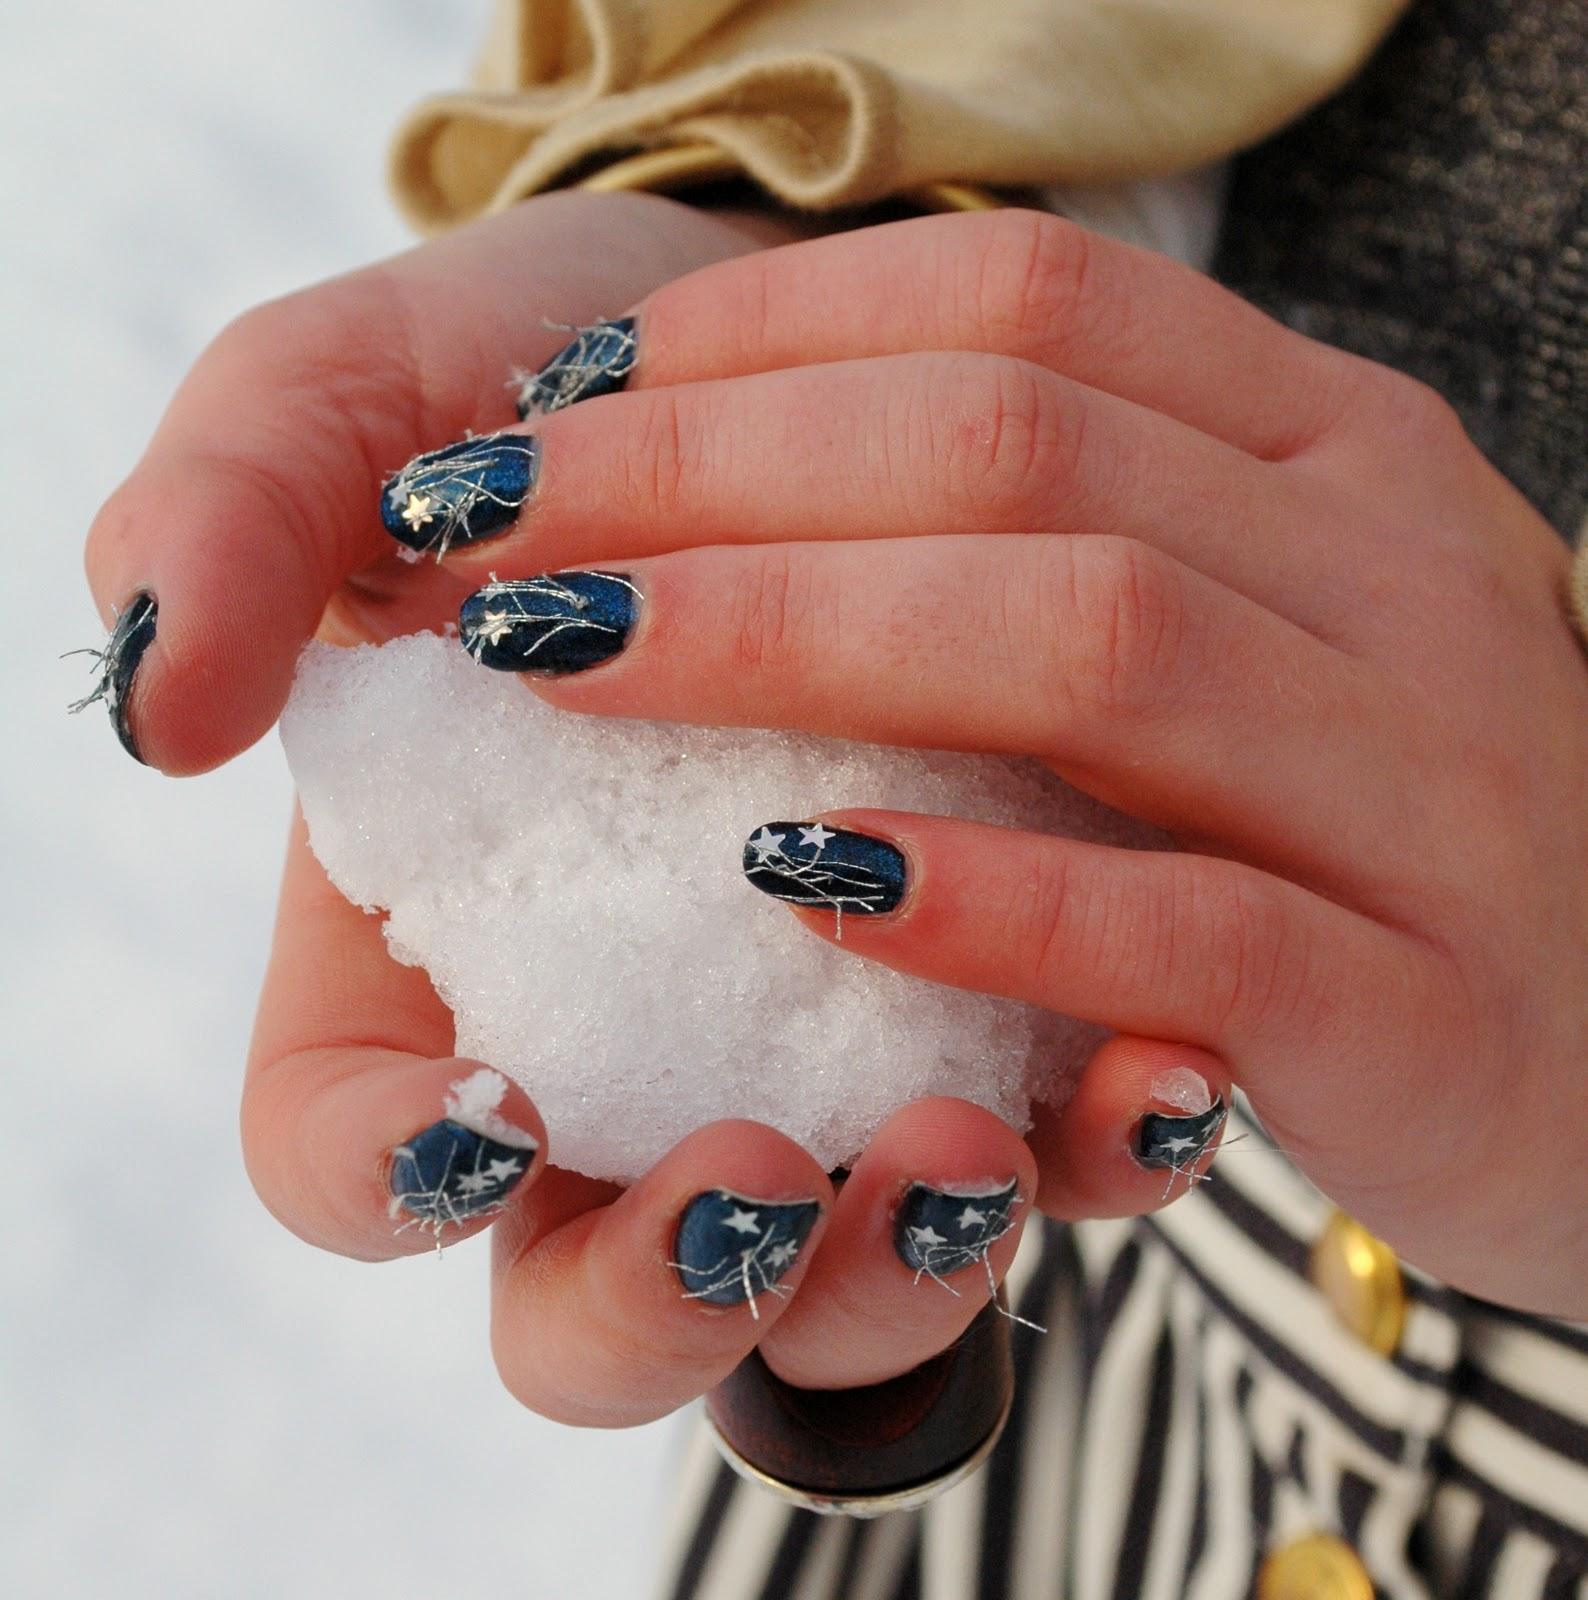 09 12 2010 Nail Art Fashionisaparty Fashionisaparty